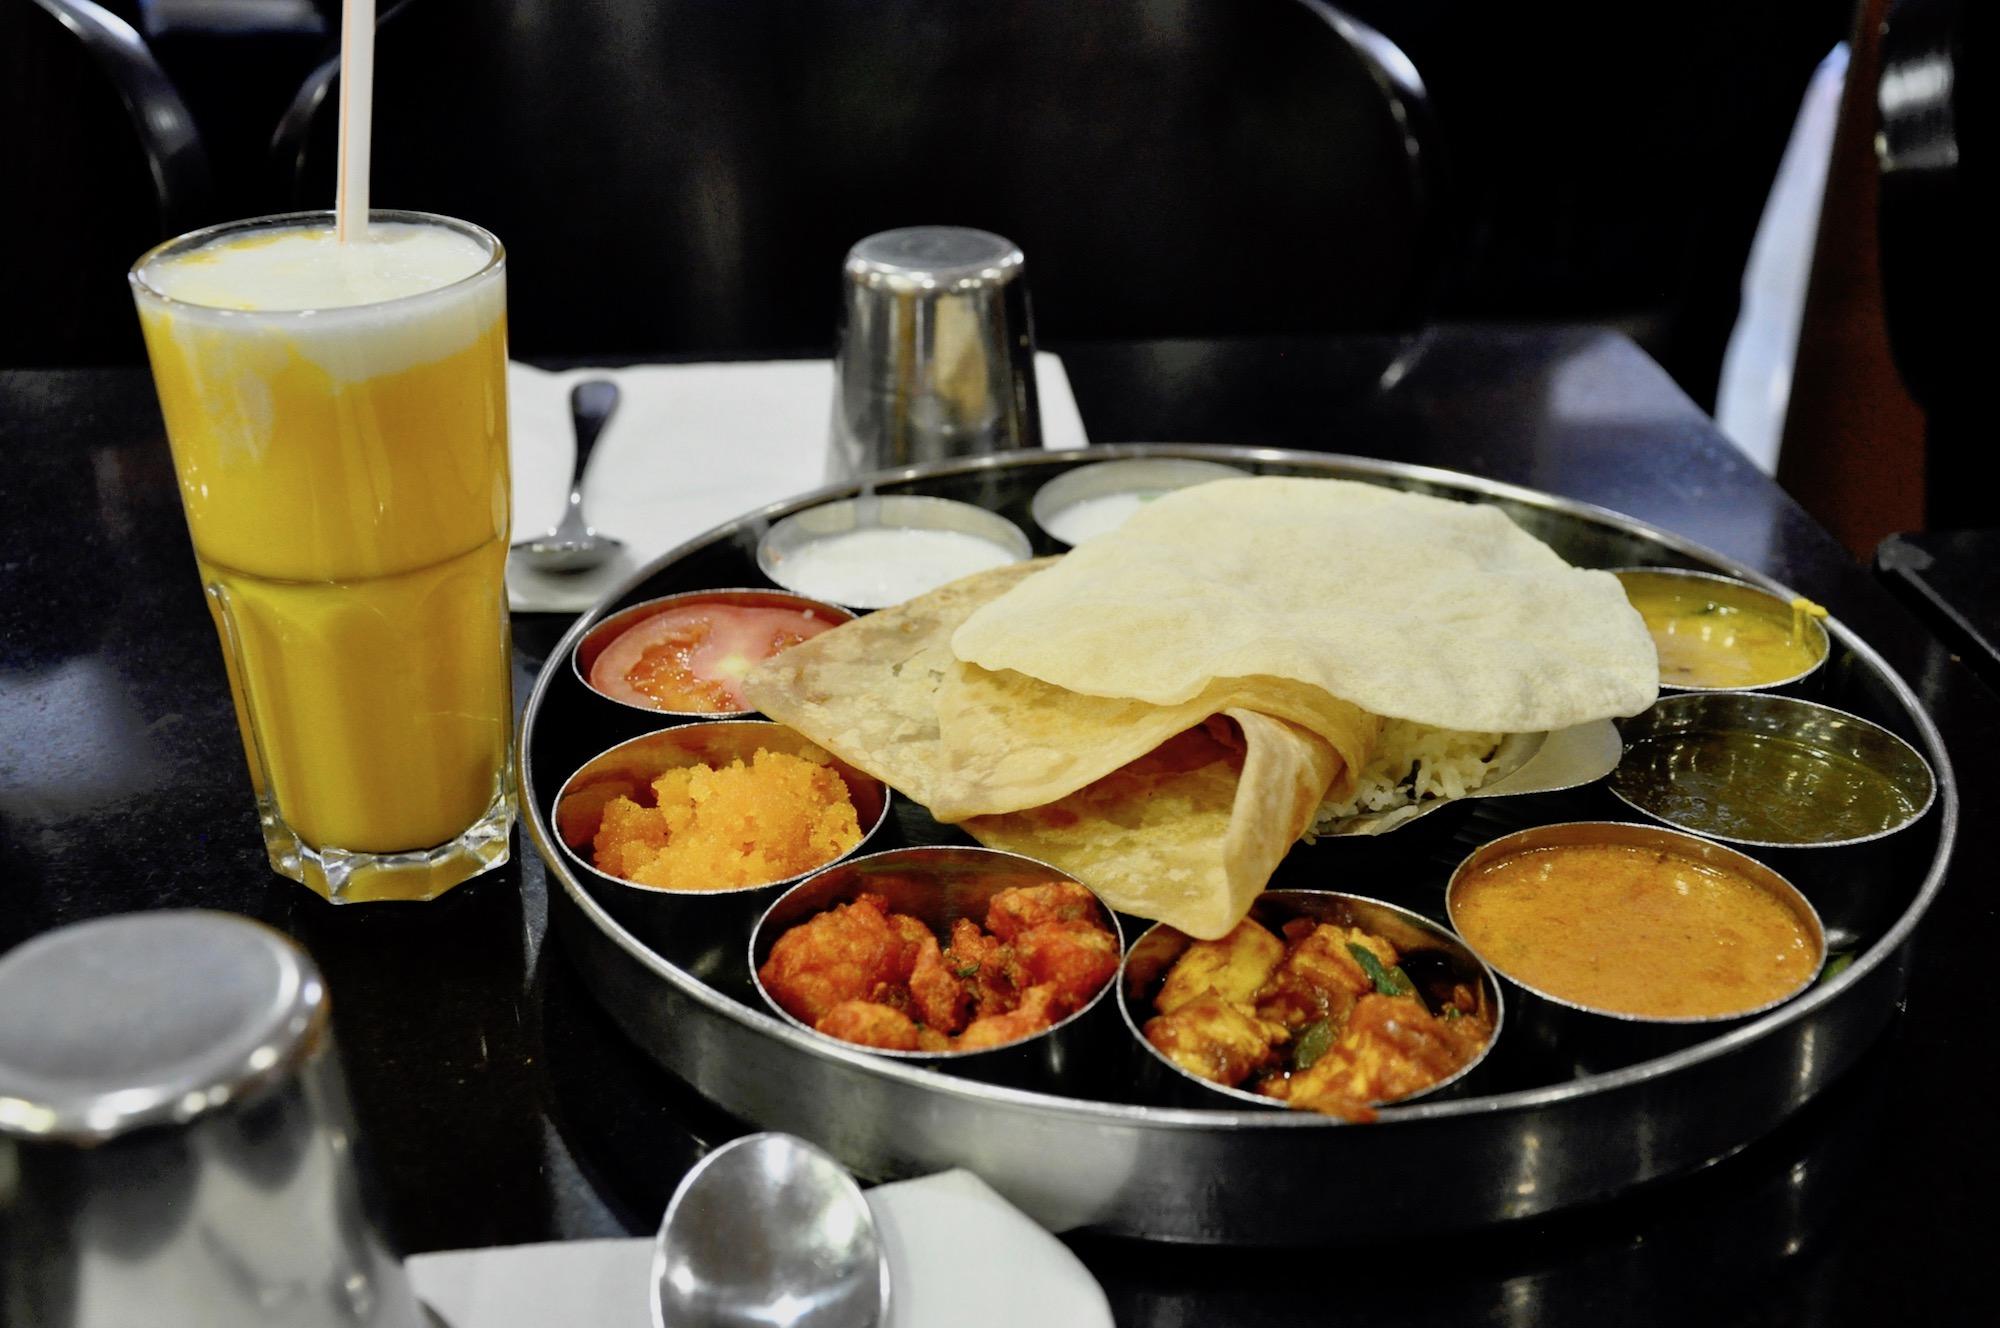 A vegetarian Thali meal at favorite Indian restaurant in Paris, Saravanaa Bhavan, near Gare du Nord station.